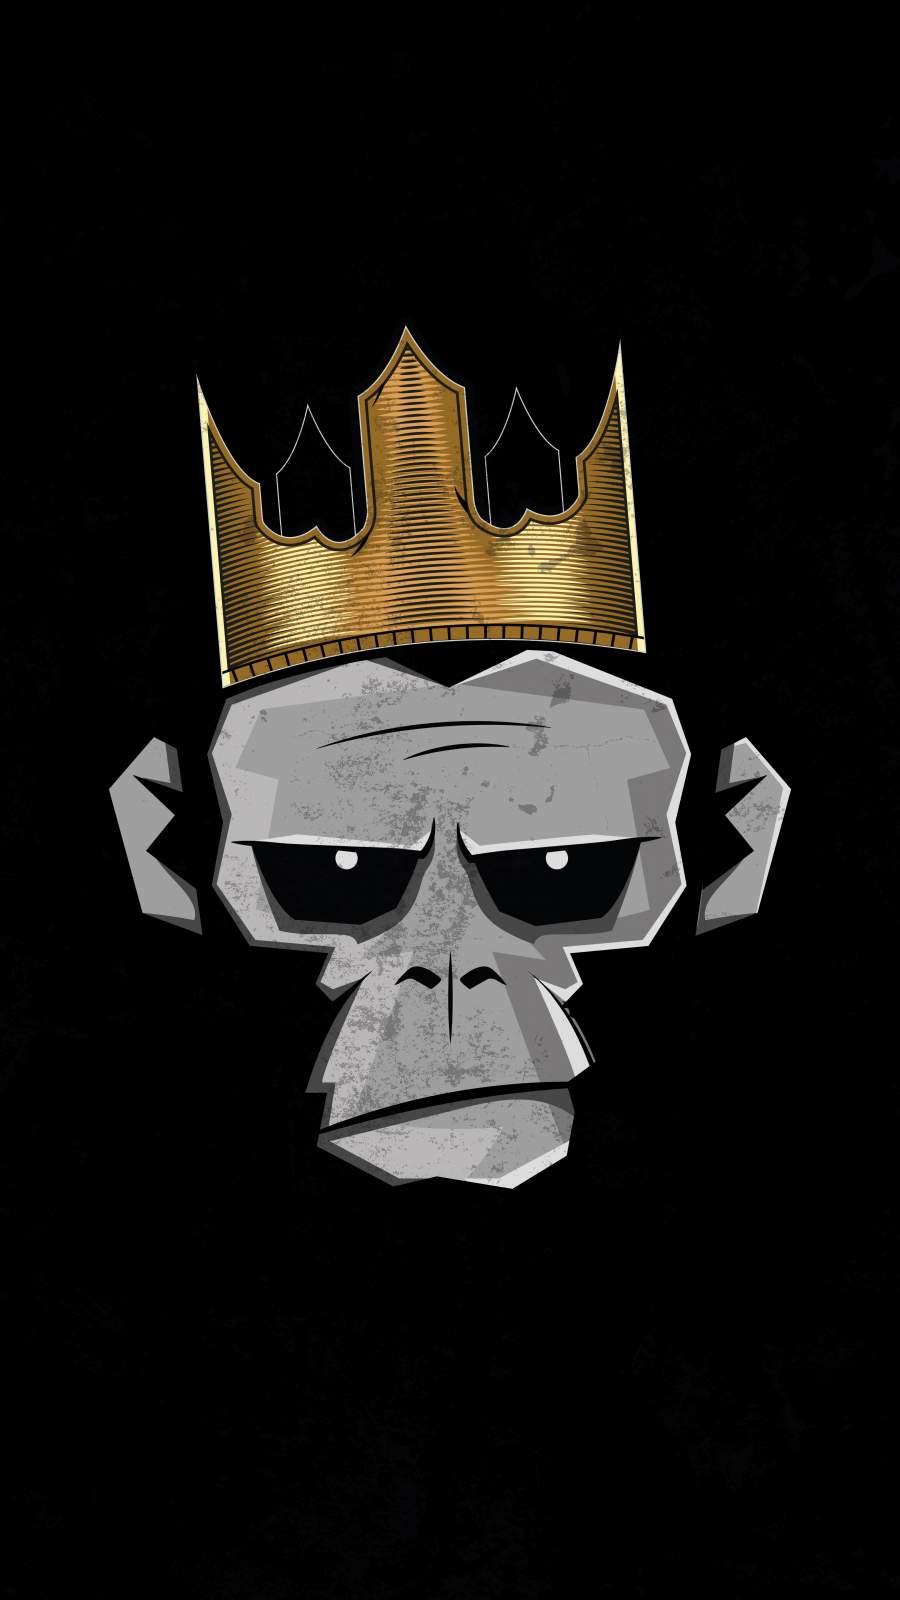 Gorilla King iPhone Wallpaper